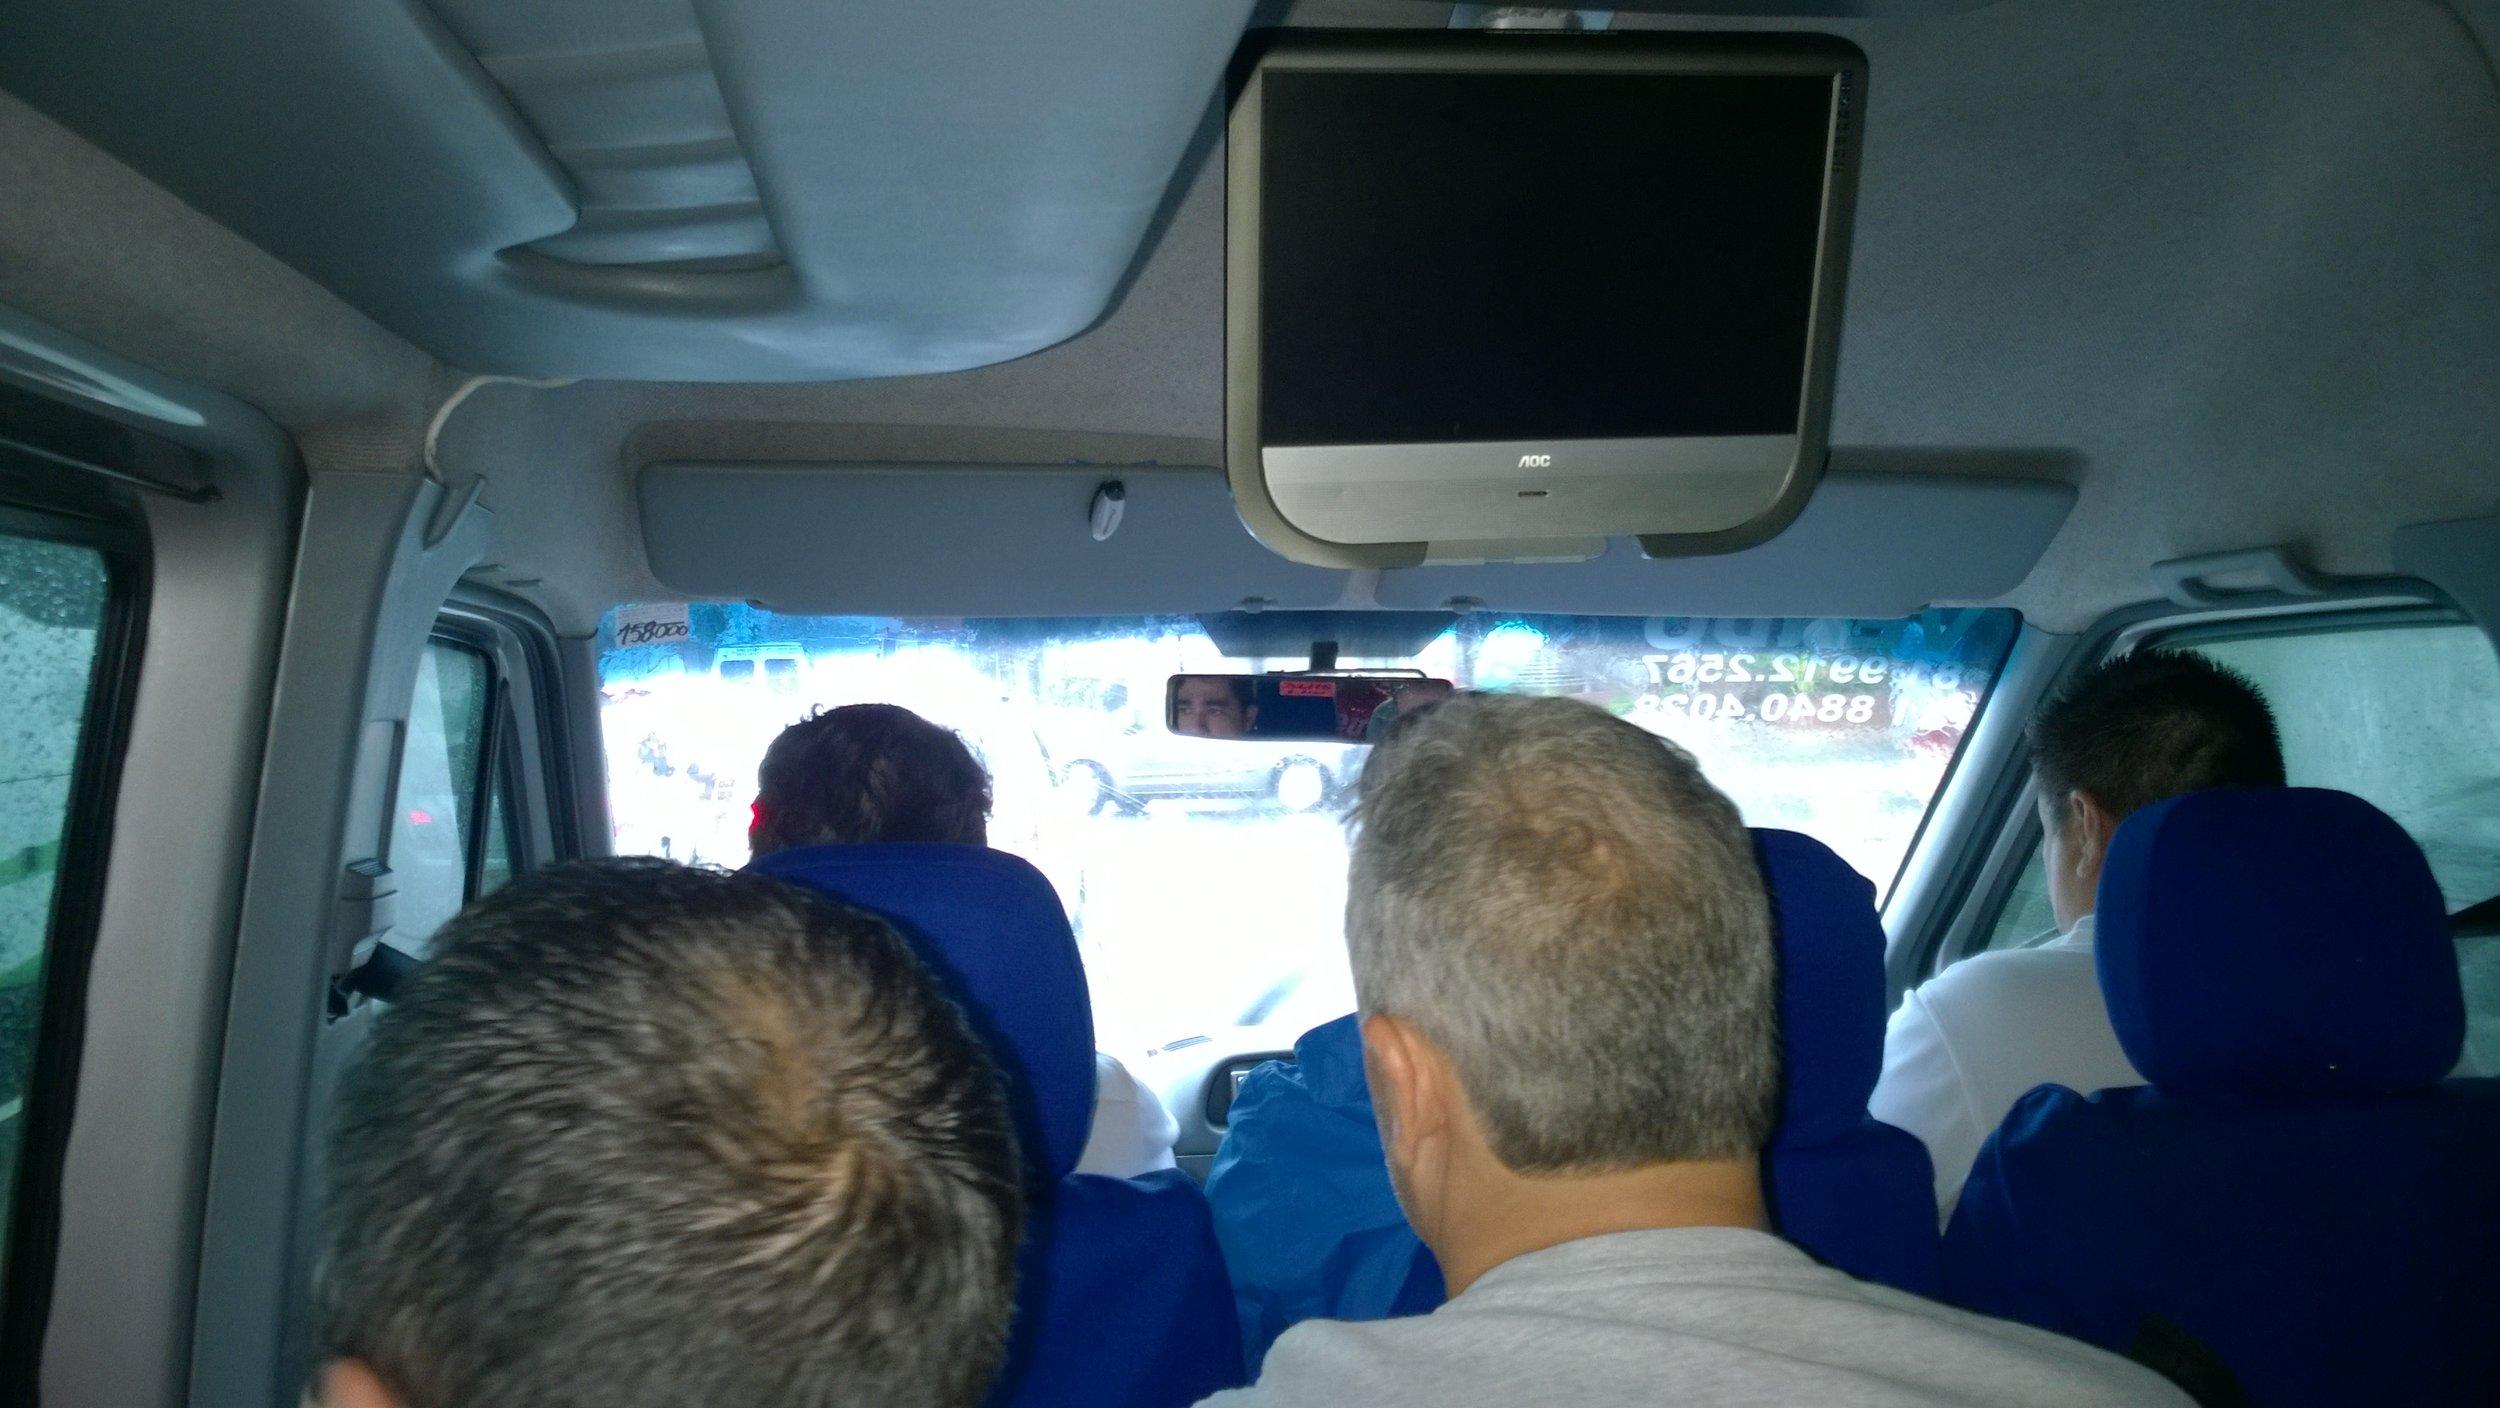 In the van heading to Arena Pernambuco